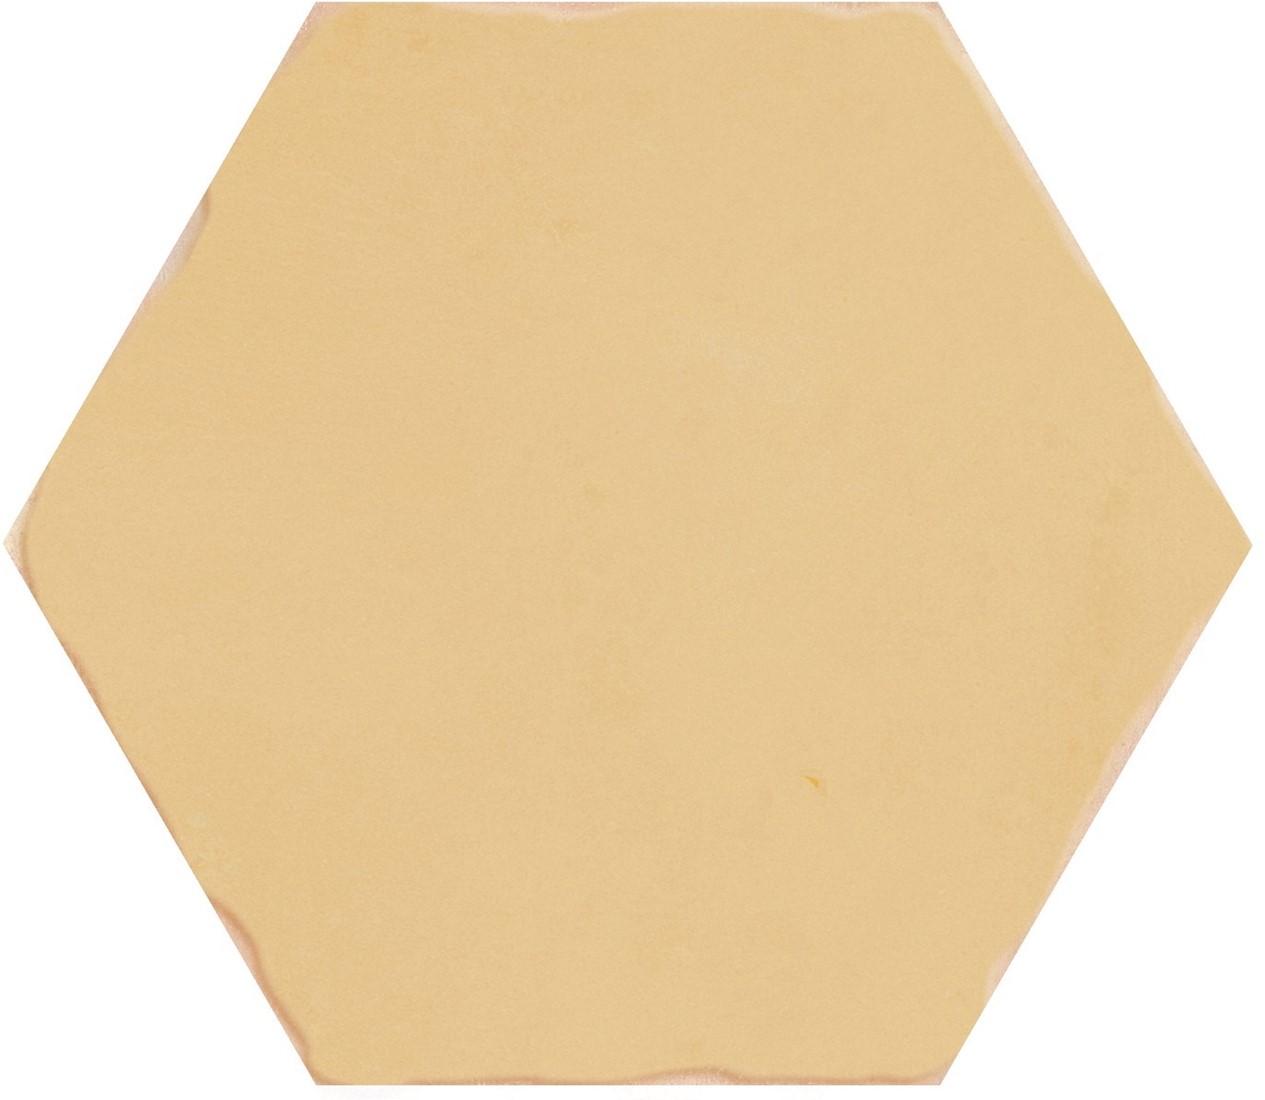 Hexagon tegels Nomade